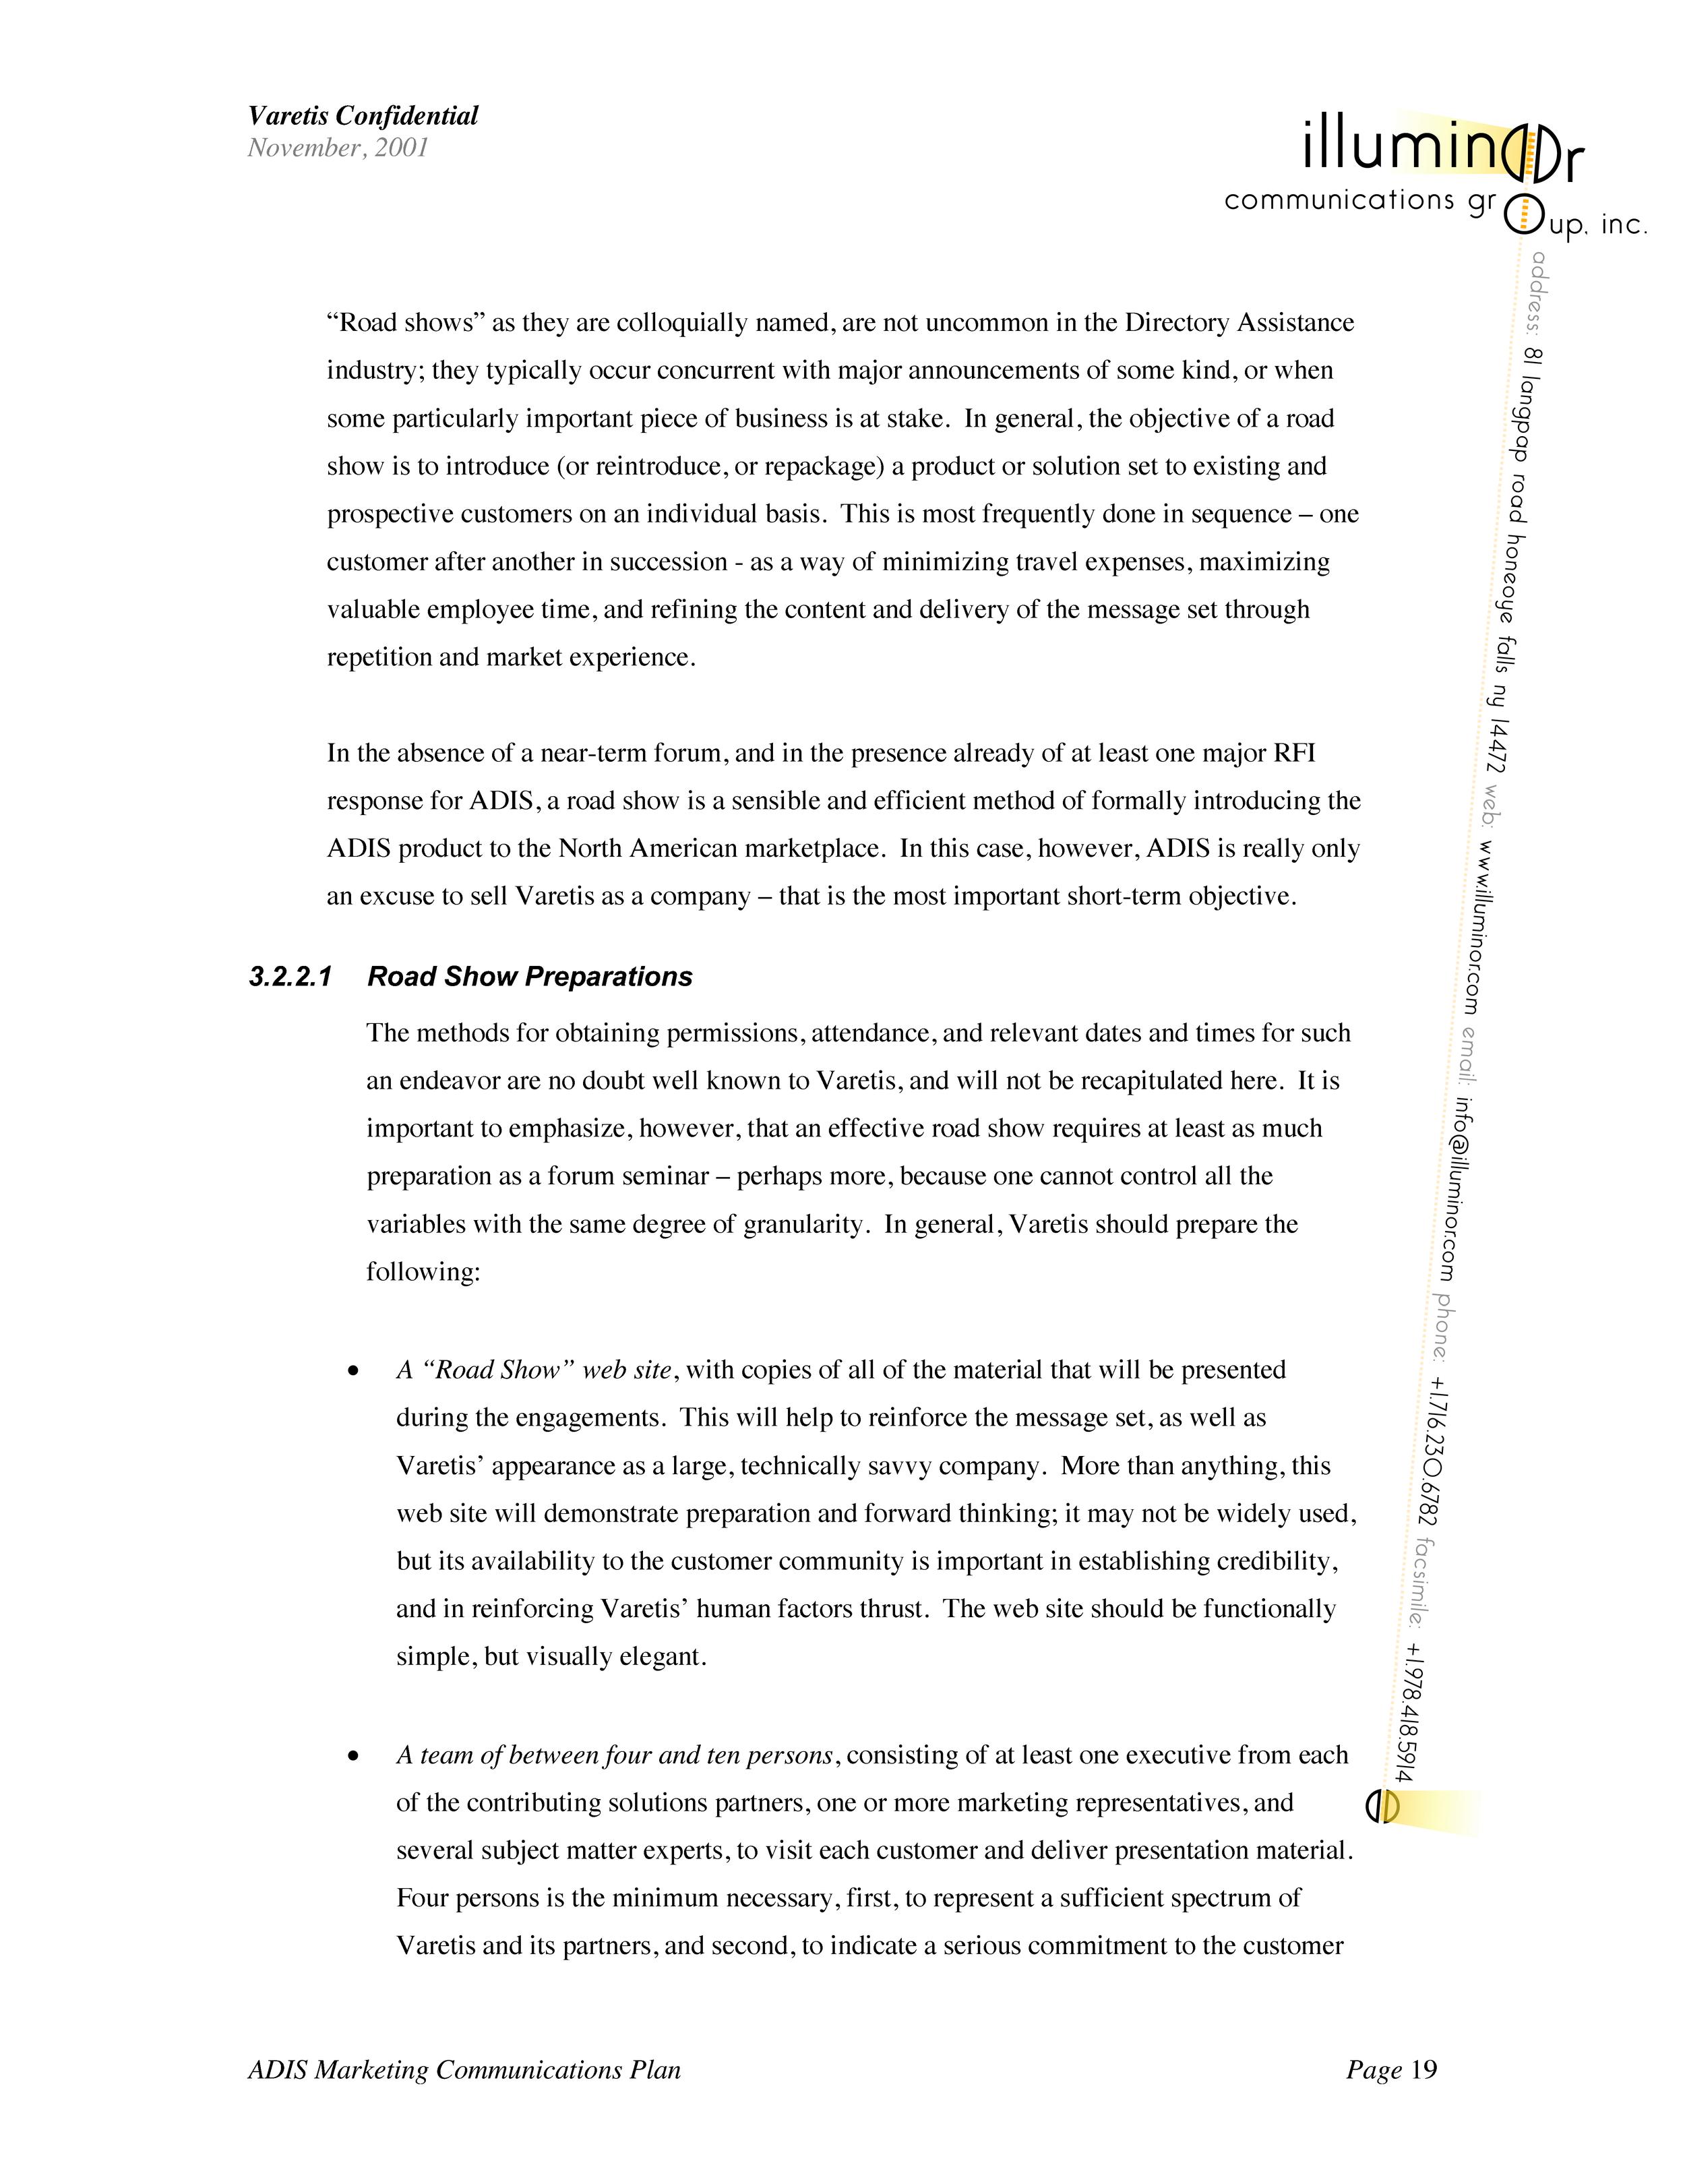 ADIS Marcomm Plan_Page_19.png